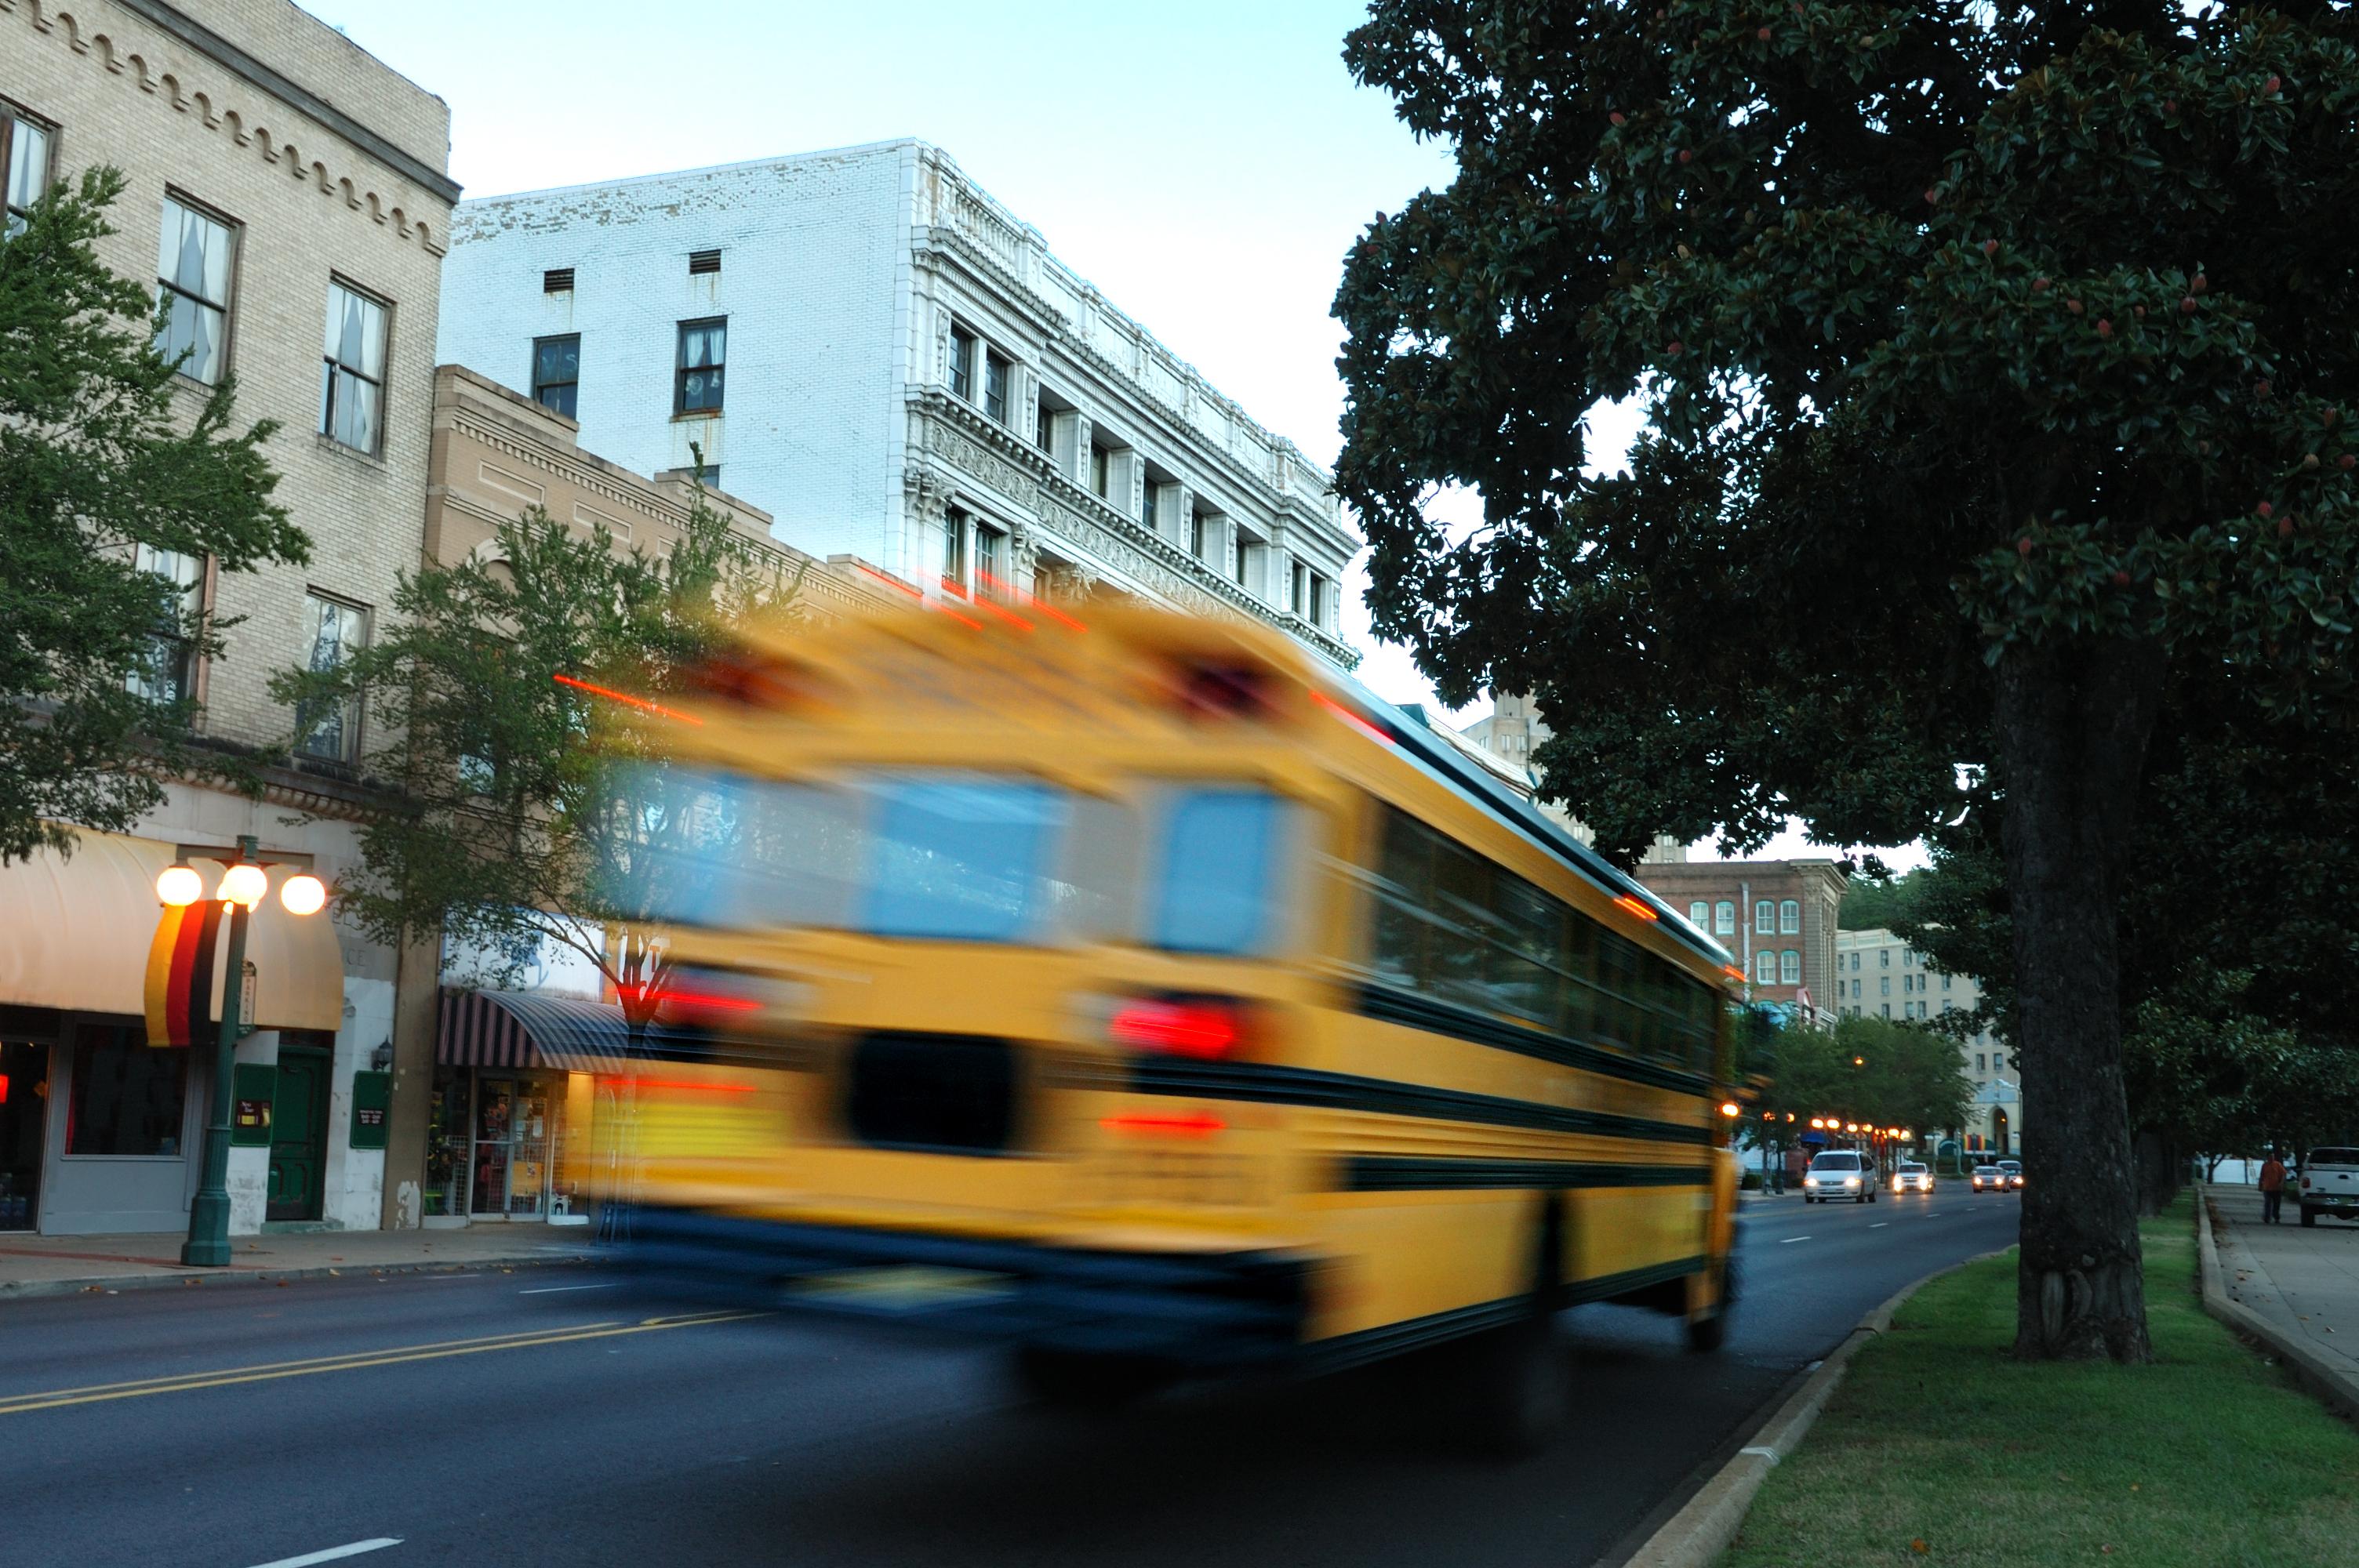 Yellow school bus in motion